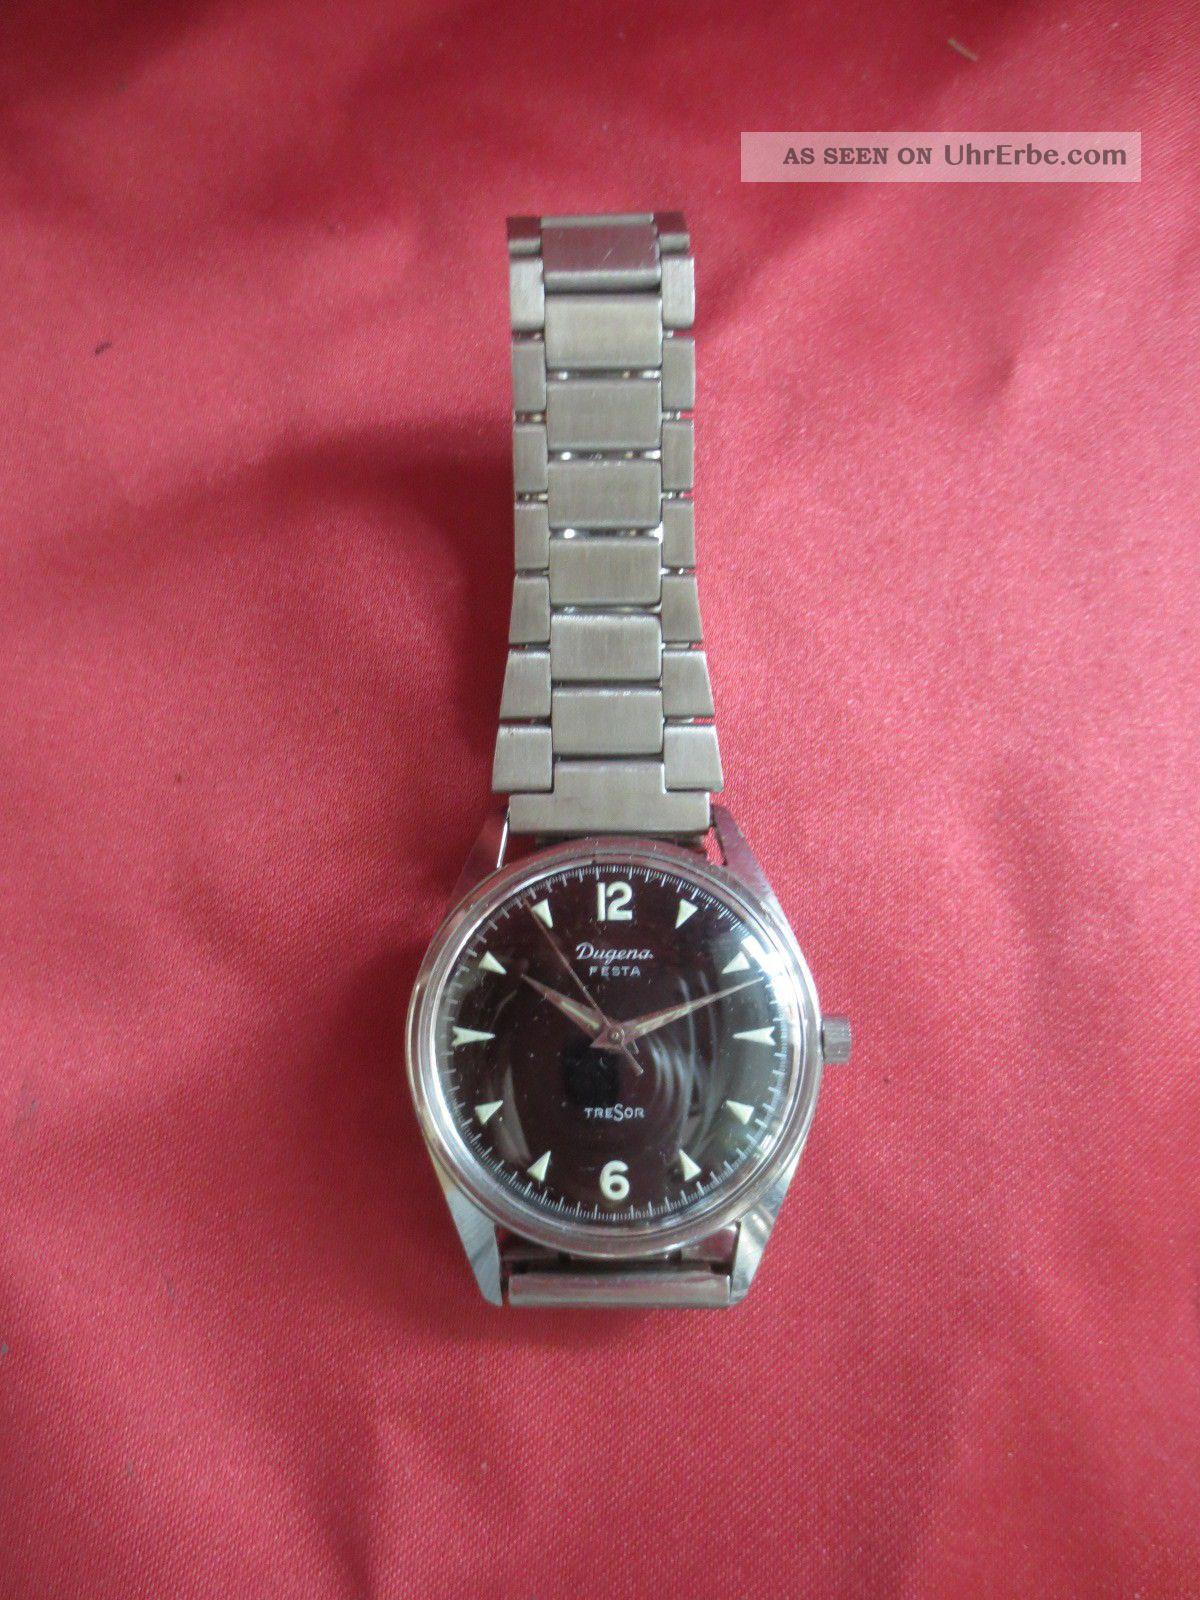 Dugena Festa Tresor Armbanduhr - Handaufzug Mechnaisch Armbanduhren Bild